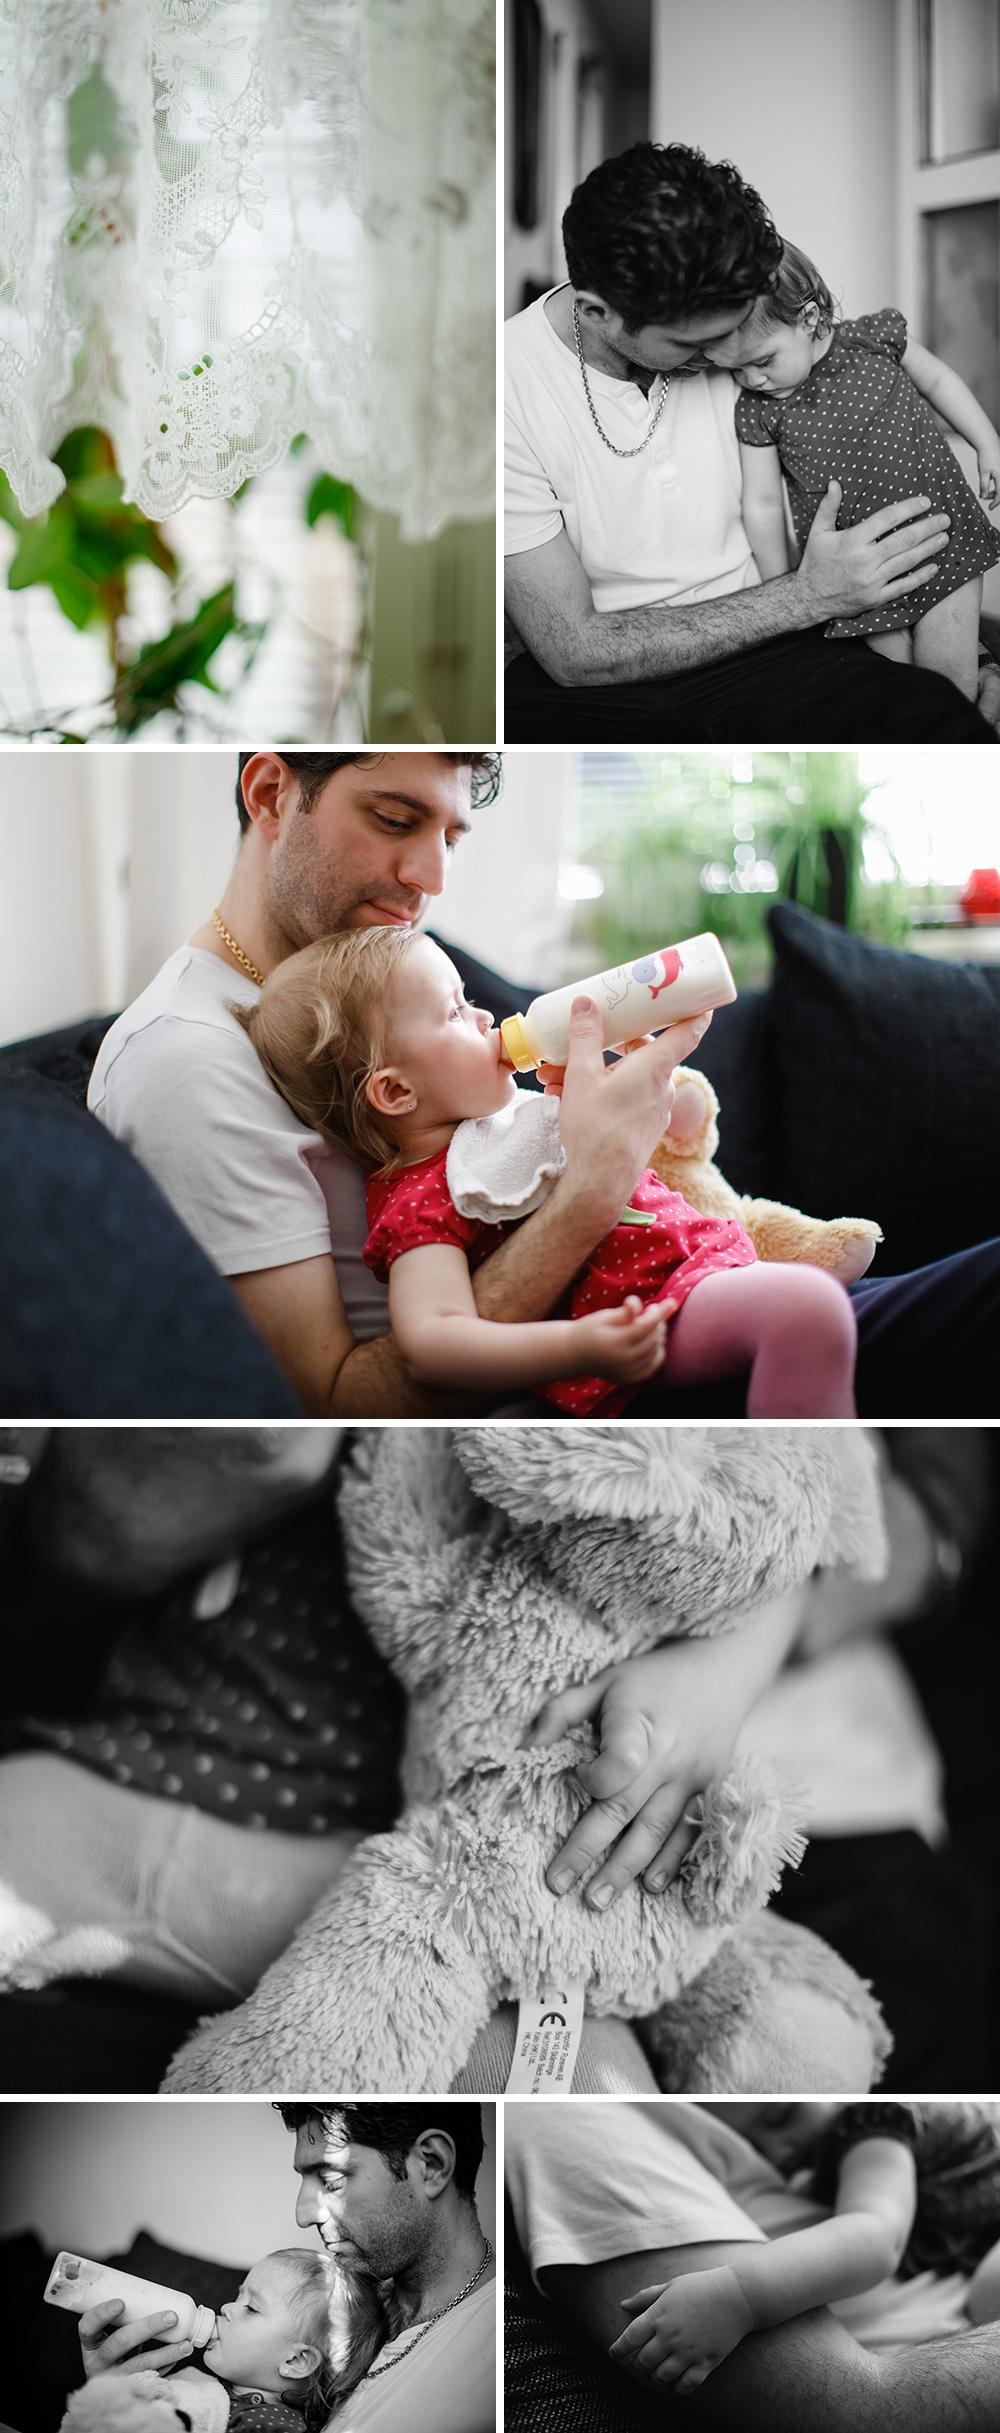 Lifestyle-Storytelling-Familjefotograf-Stockholm_12.jpg